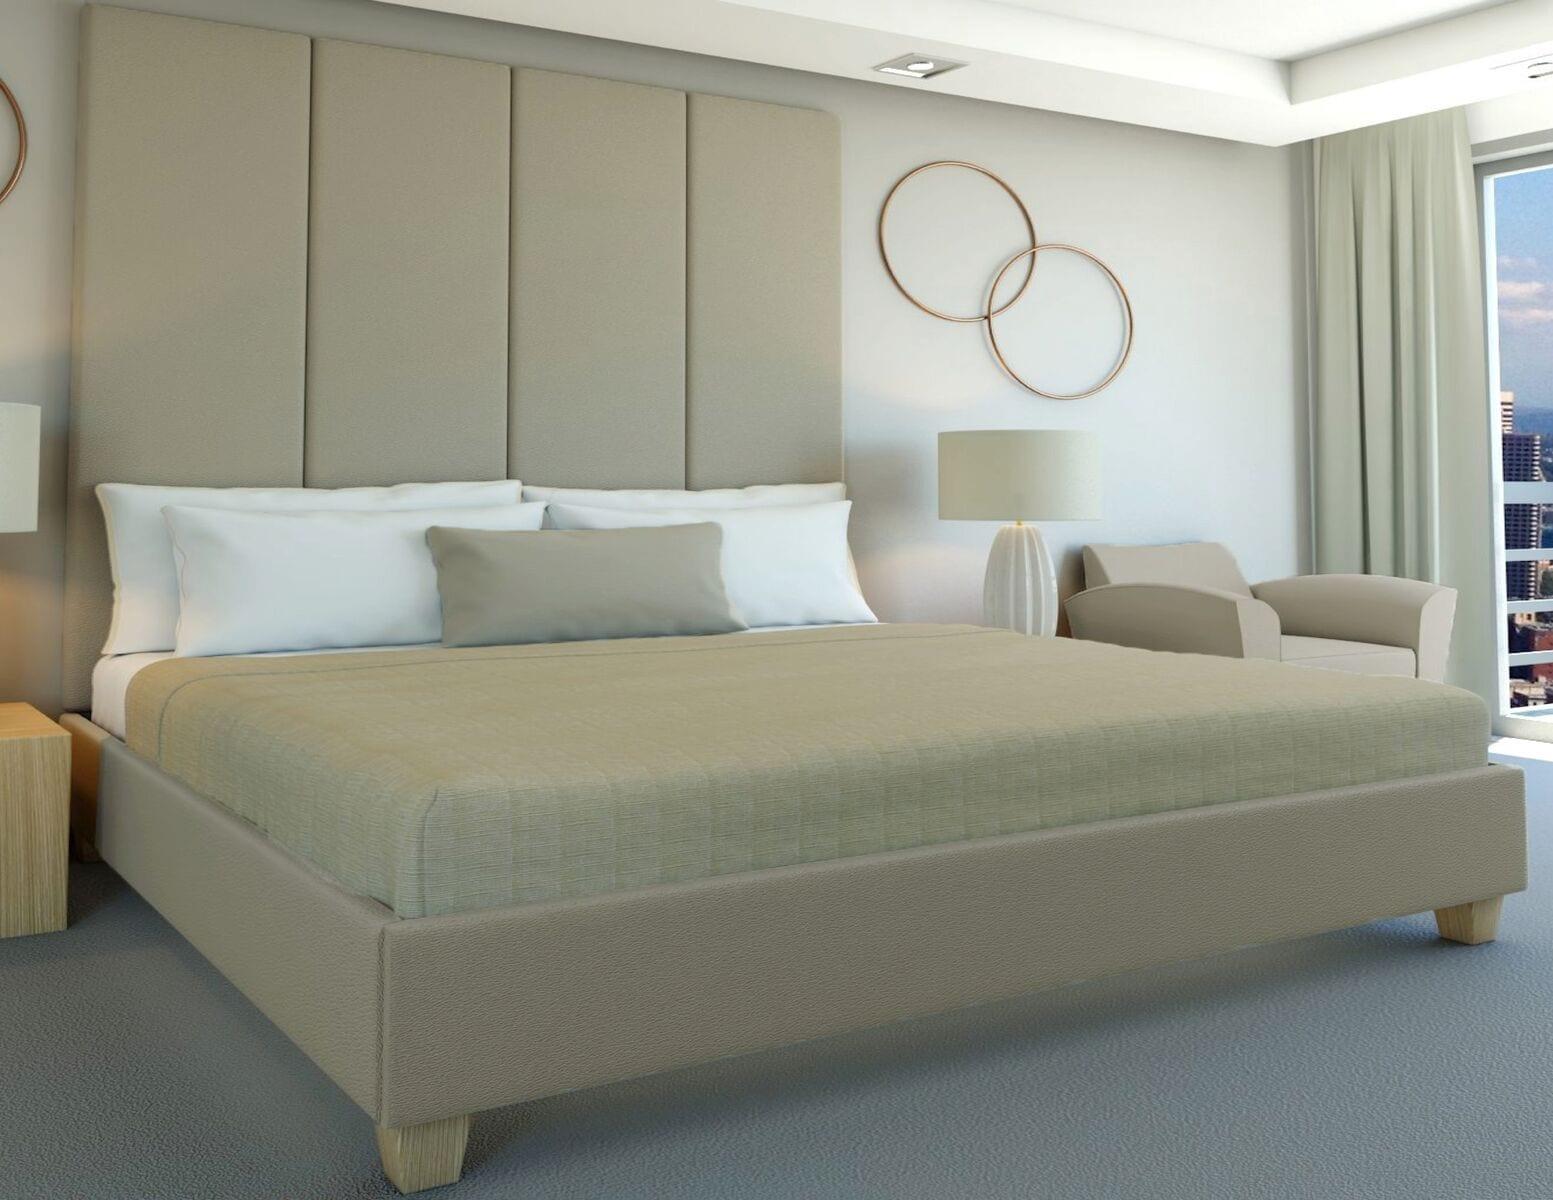 Edge Hunt - Wall mounted upholstered, luxury headboard with custom upholstered wall panels - Custom luxury, upholstered beds with high end, bedroom textiles | Blend Home Furnishings